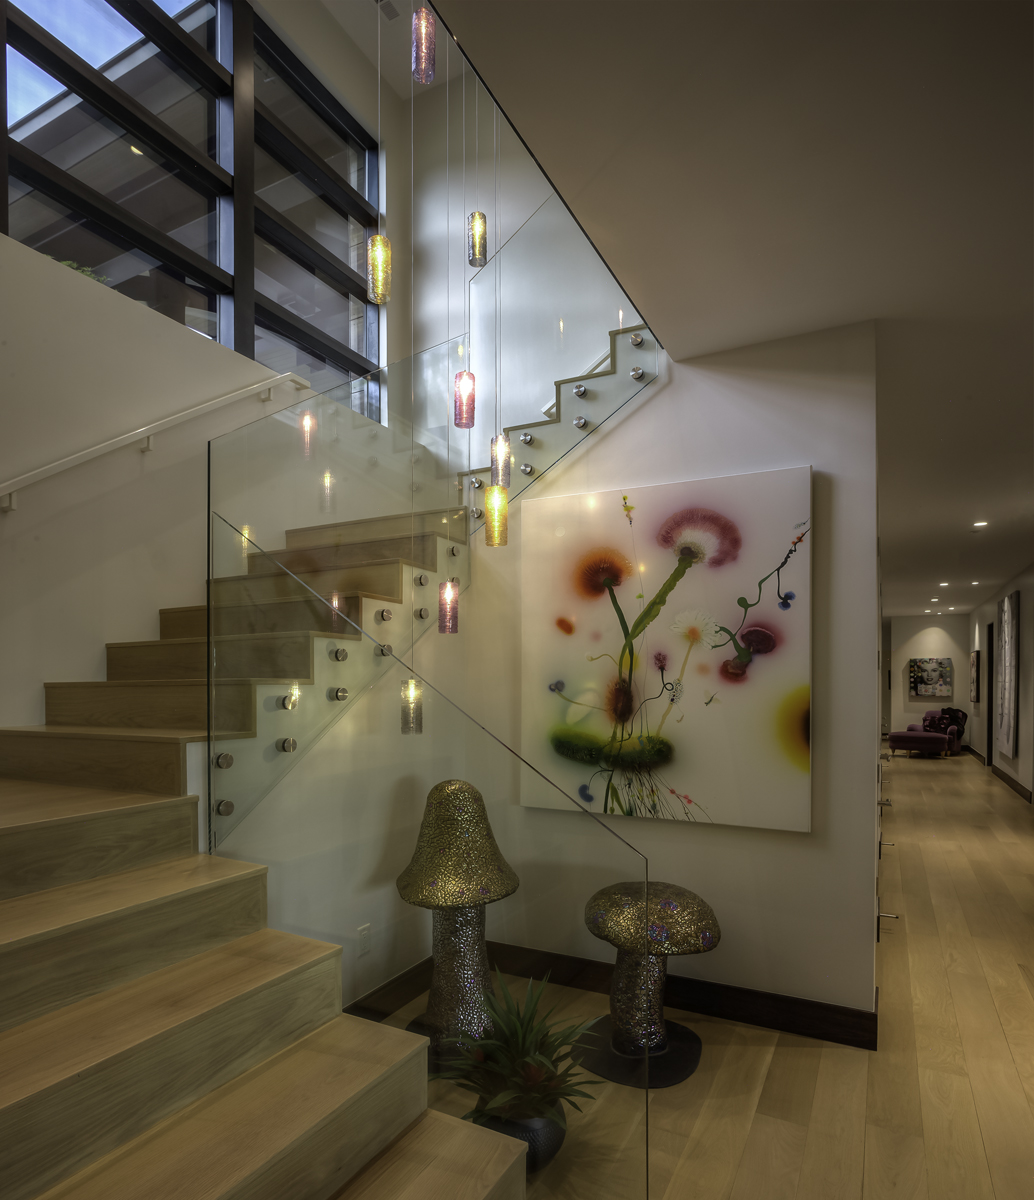 McArthur-3806-18a_E0E8688a_Stairs